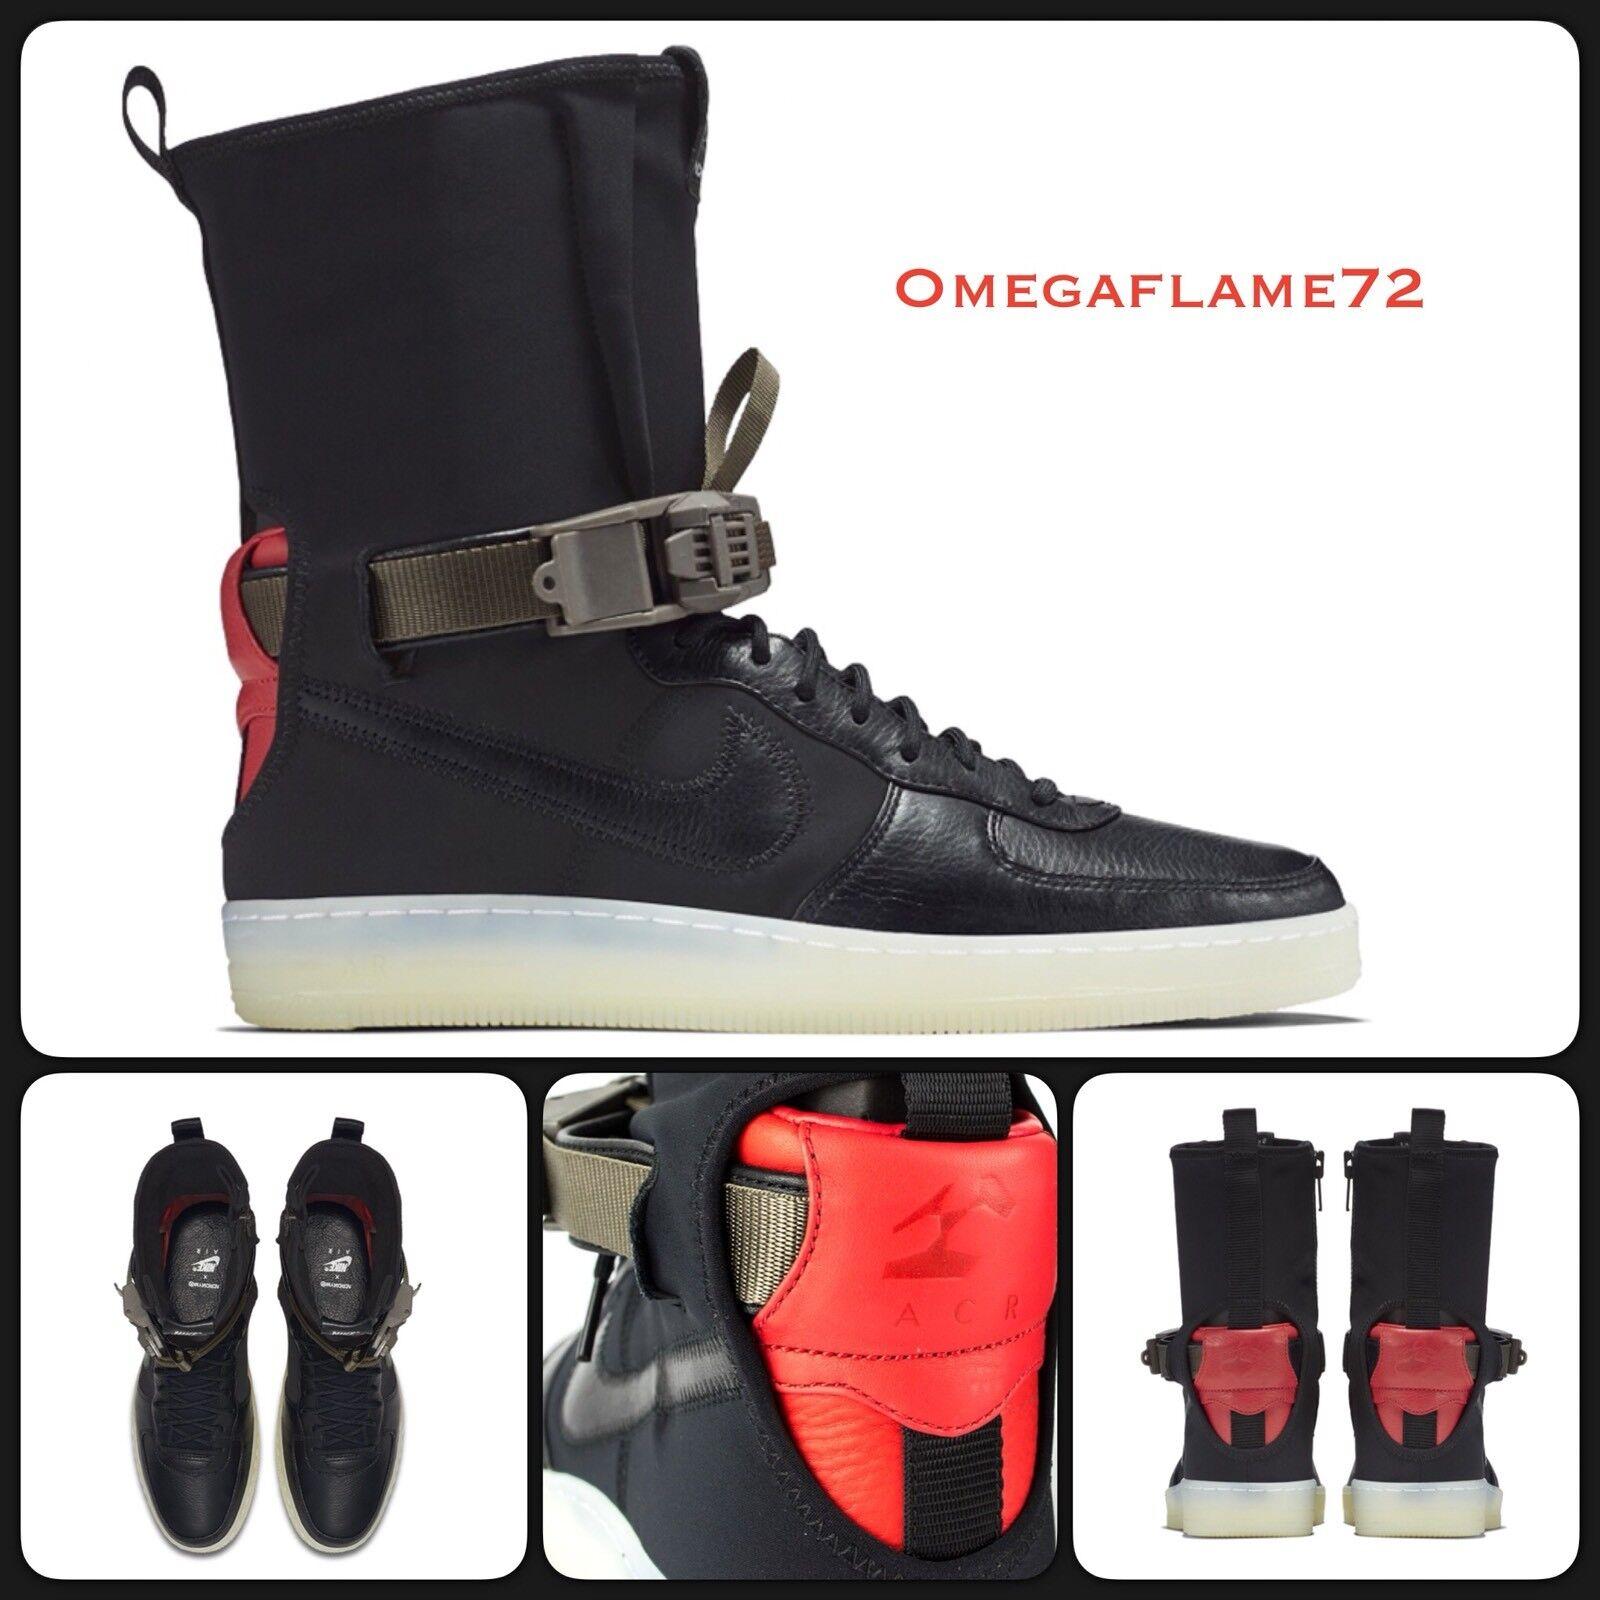 Nike Acronym AF1 EU Downtown Hi SP 649941-006,8.5 EU AF1 43 US 9.5 Noir  Crimson ef08da